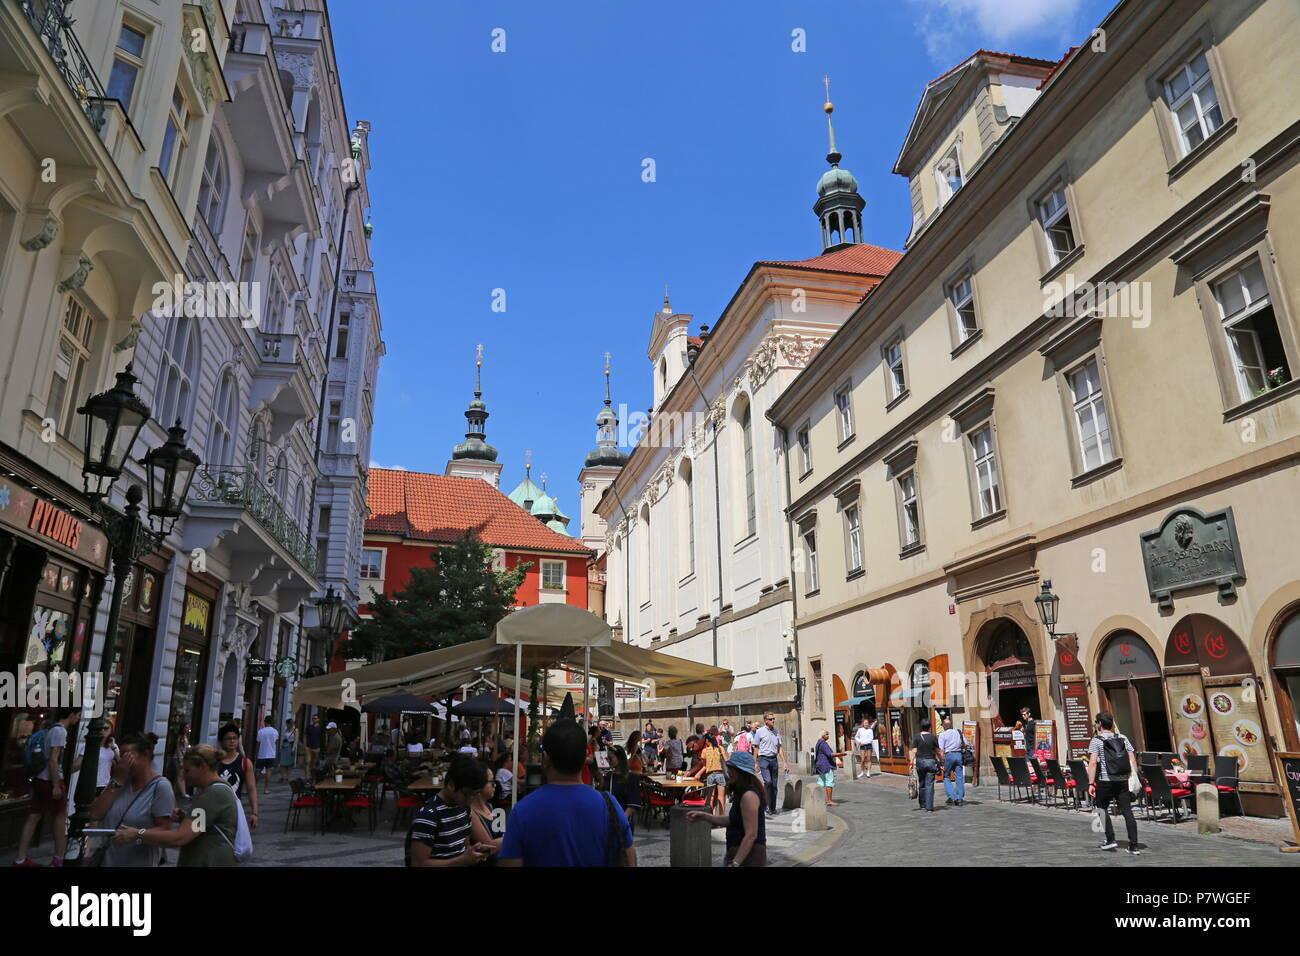 Street cafes and Clementinum entrance, Karlova, Staré Město (Old Town), Prague, Czechia (Czech Republic), Europe - Stock Image